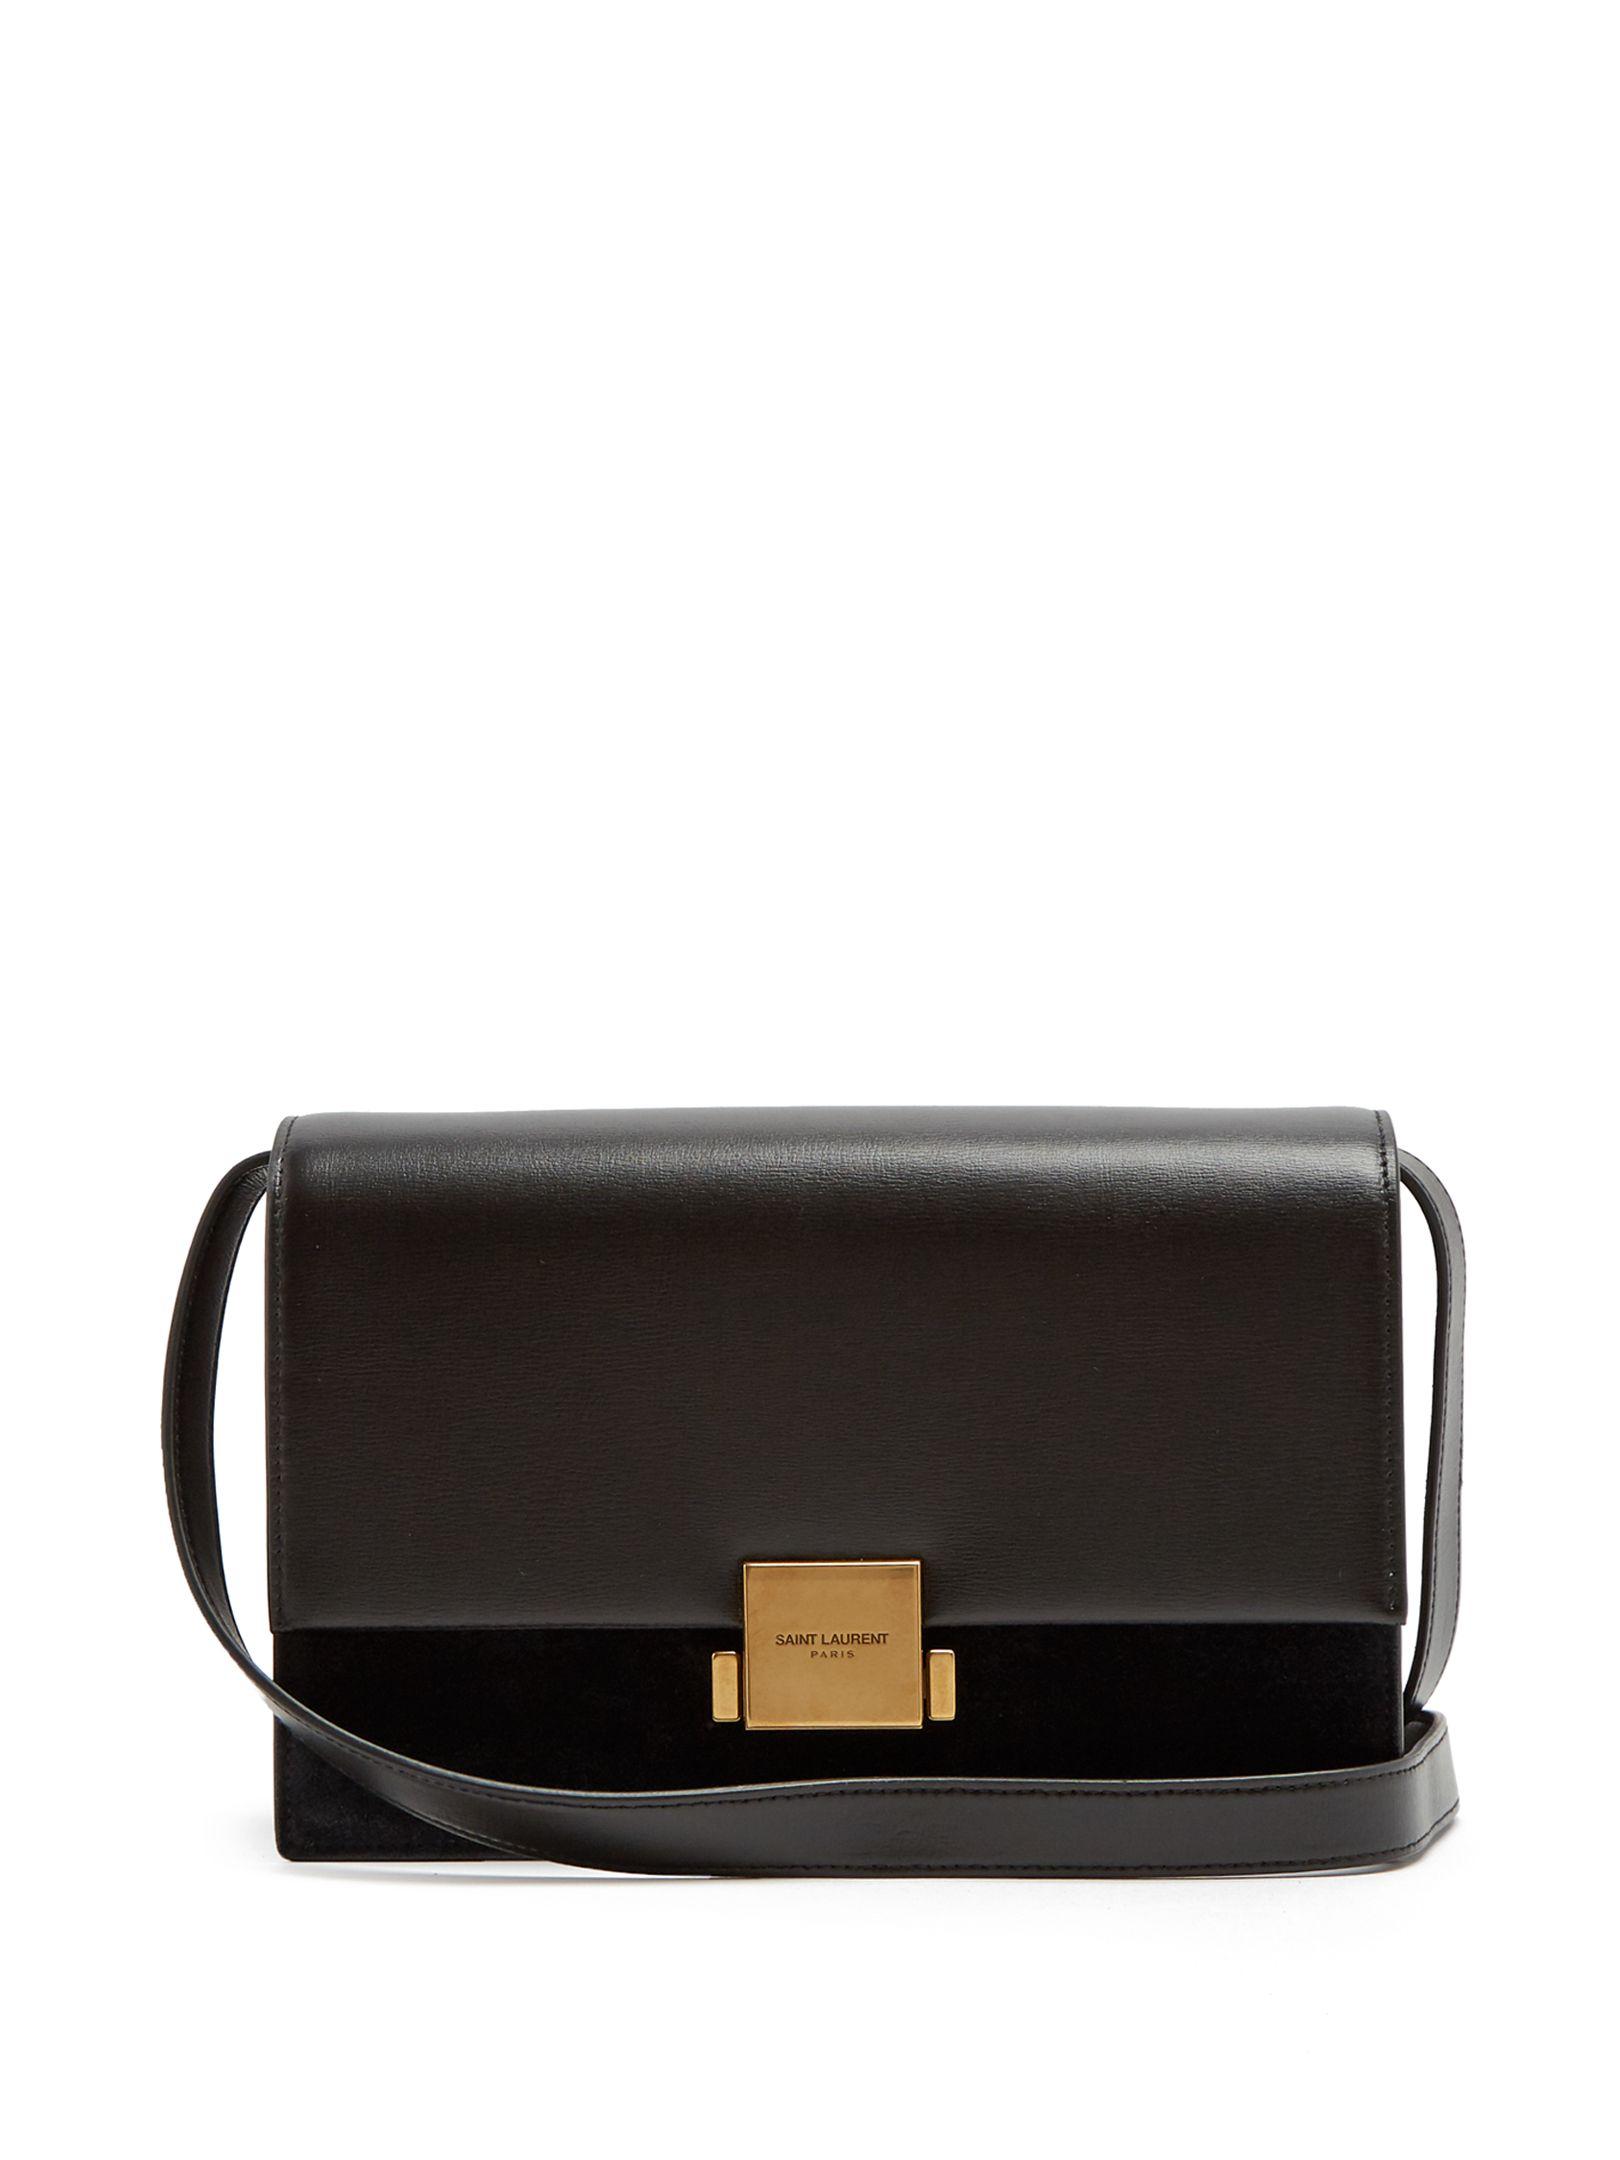 faf33f890426c Saint Laurent Bellechasse medium leather and suede bag